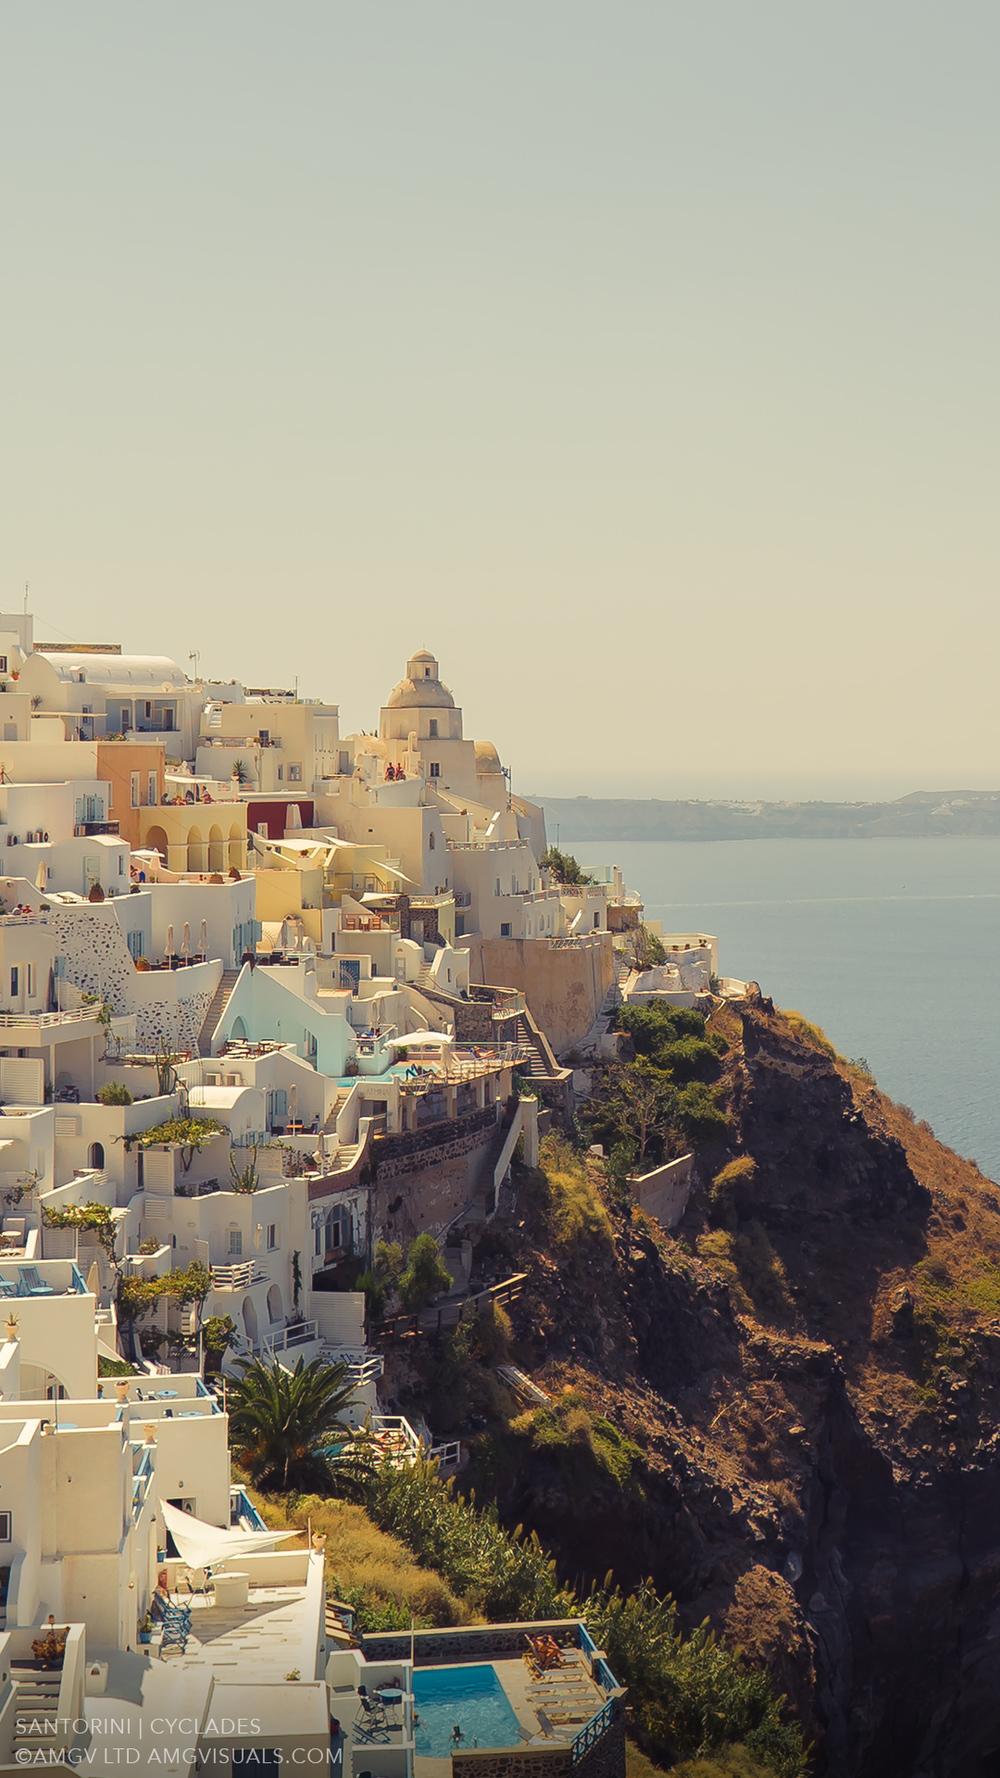 ©AMGV-LTD-Santorini+Cyclades-15.jpg